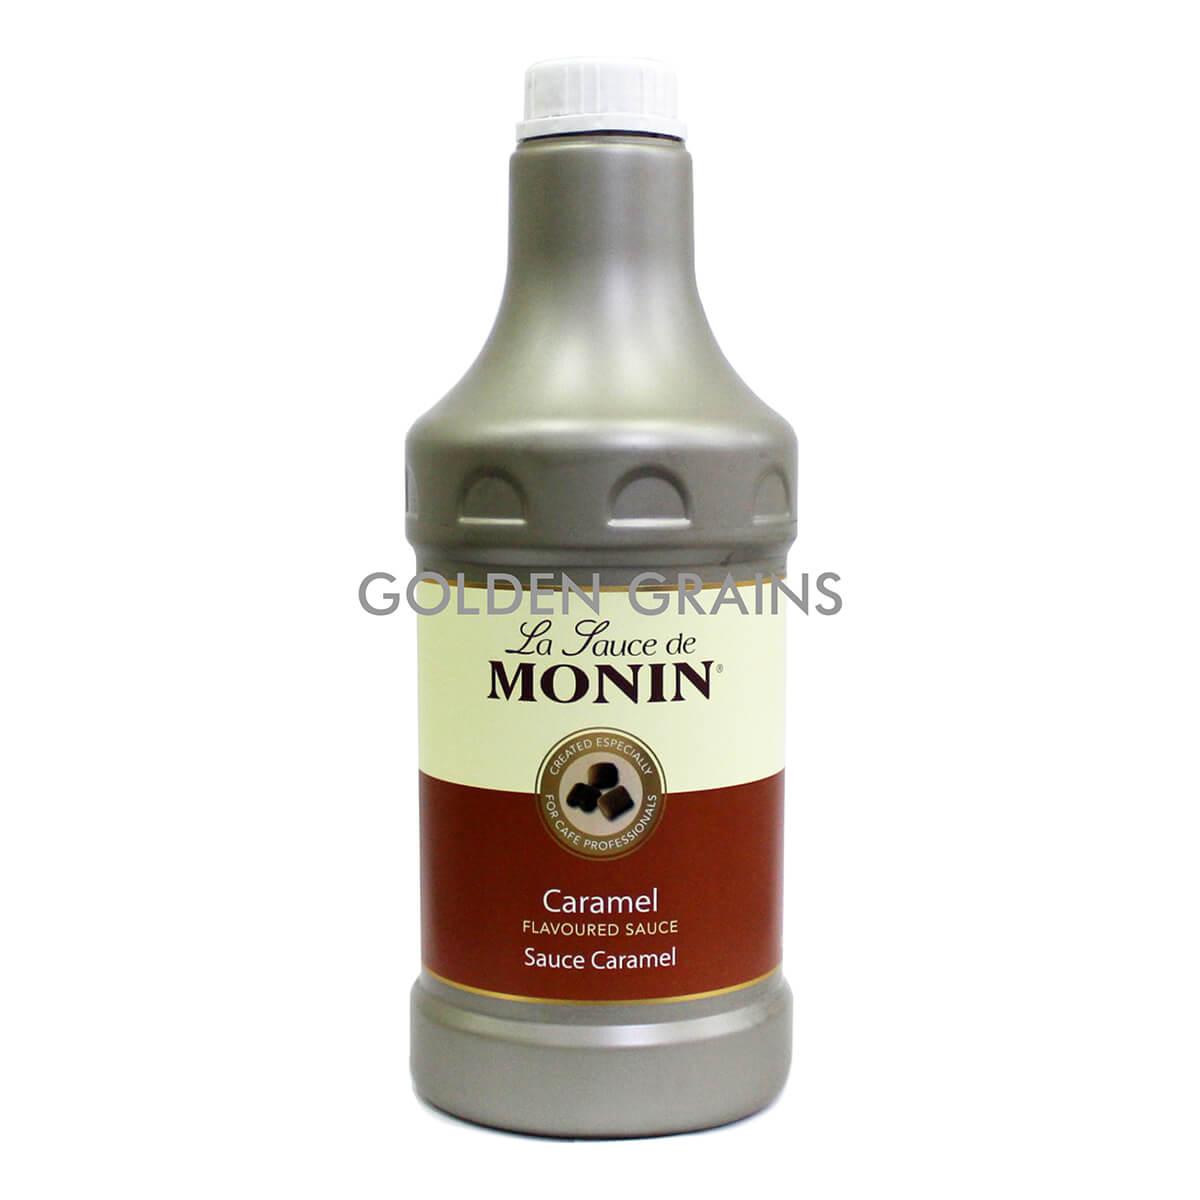 Golden Grains - Monin - Caramel Sauce FR - Front.jpg